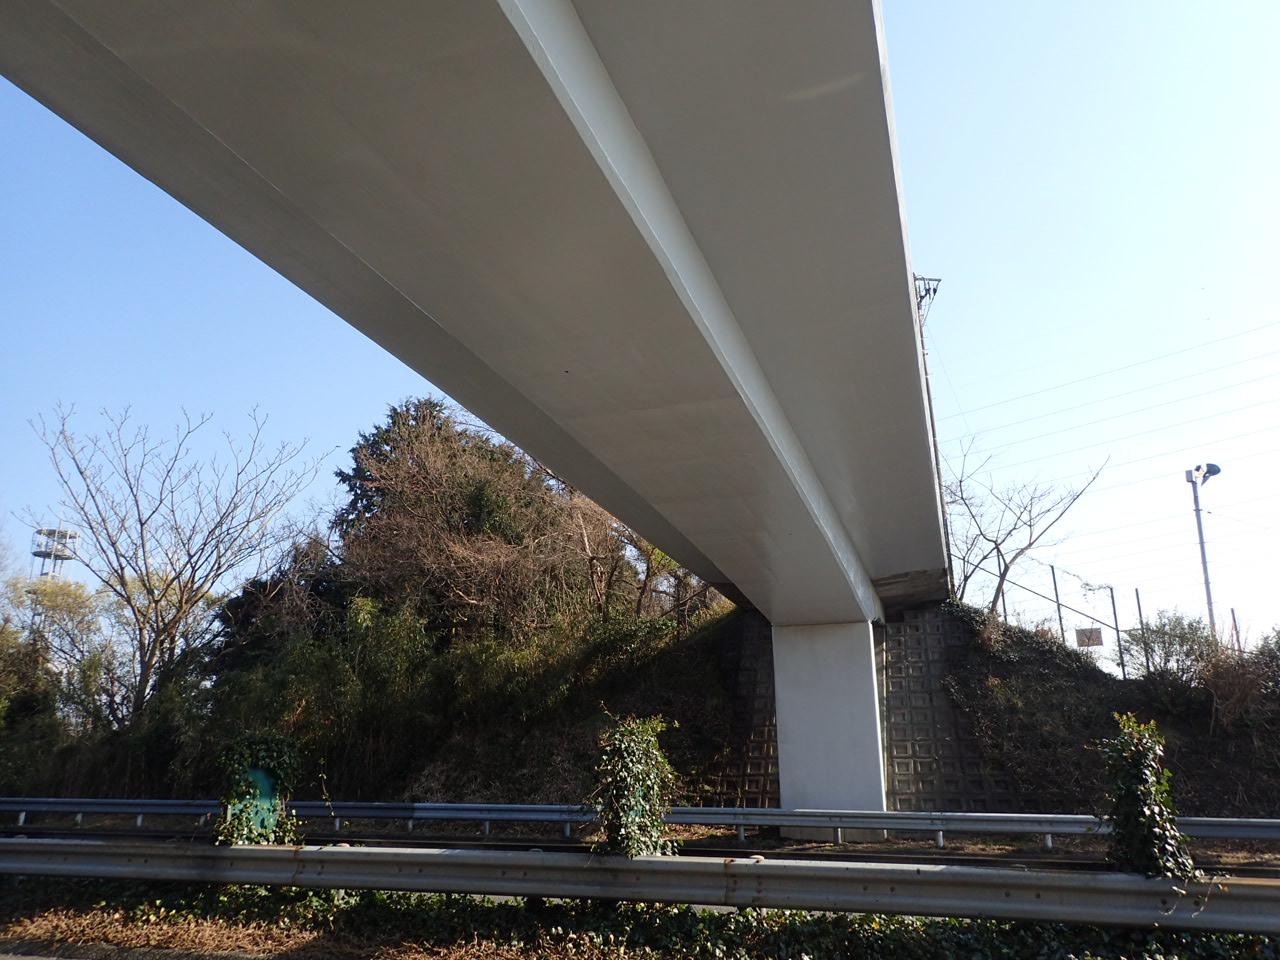 H28 東名高速道路 沼津IC~富士IC間跨道橋補修工事